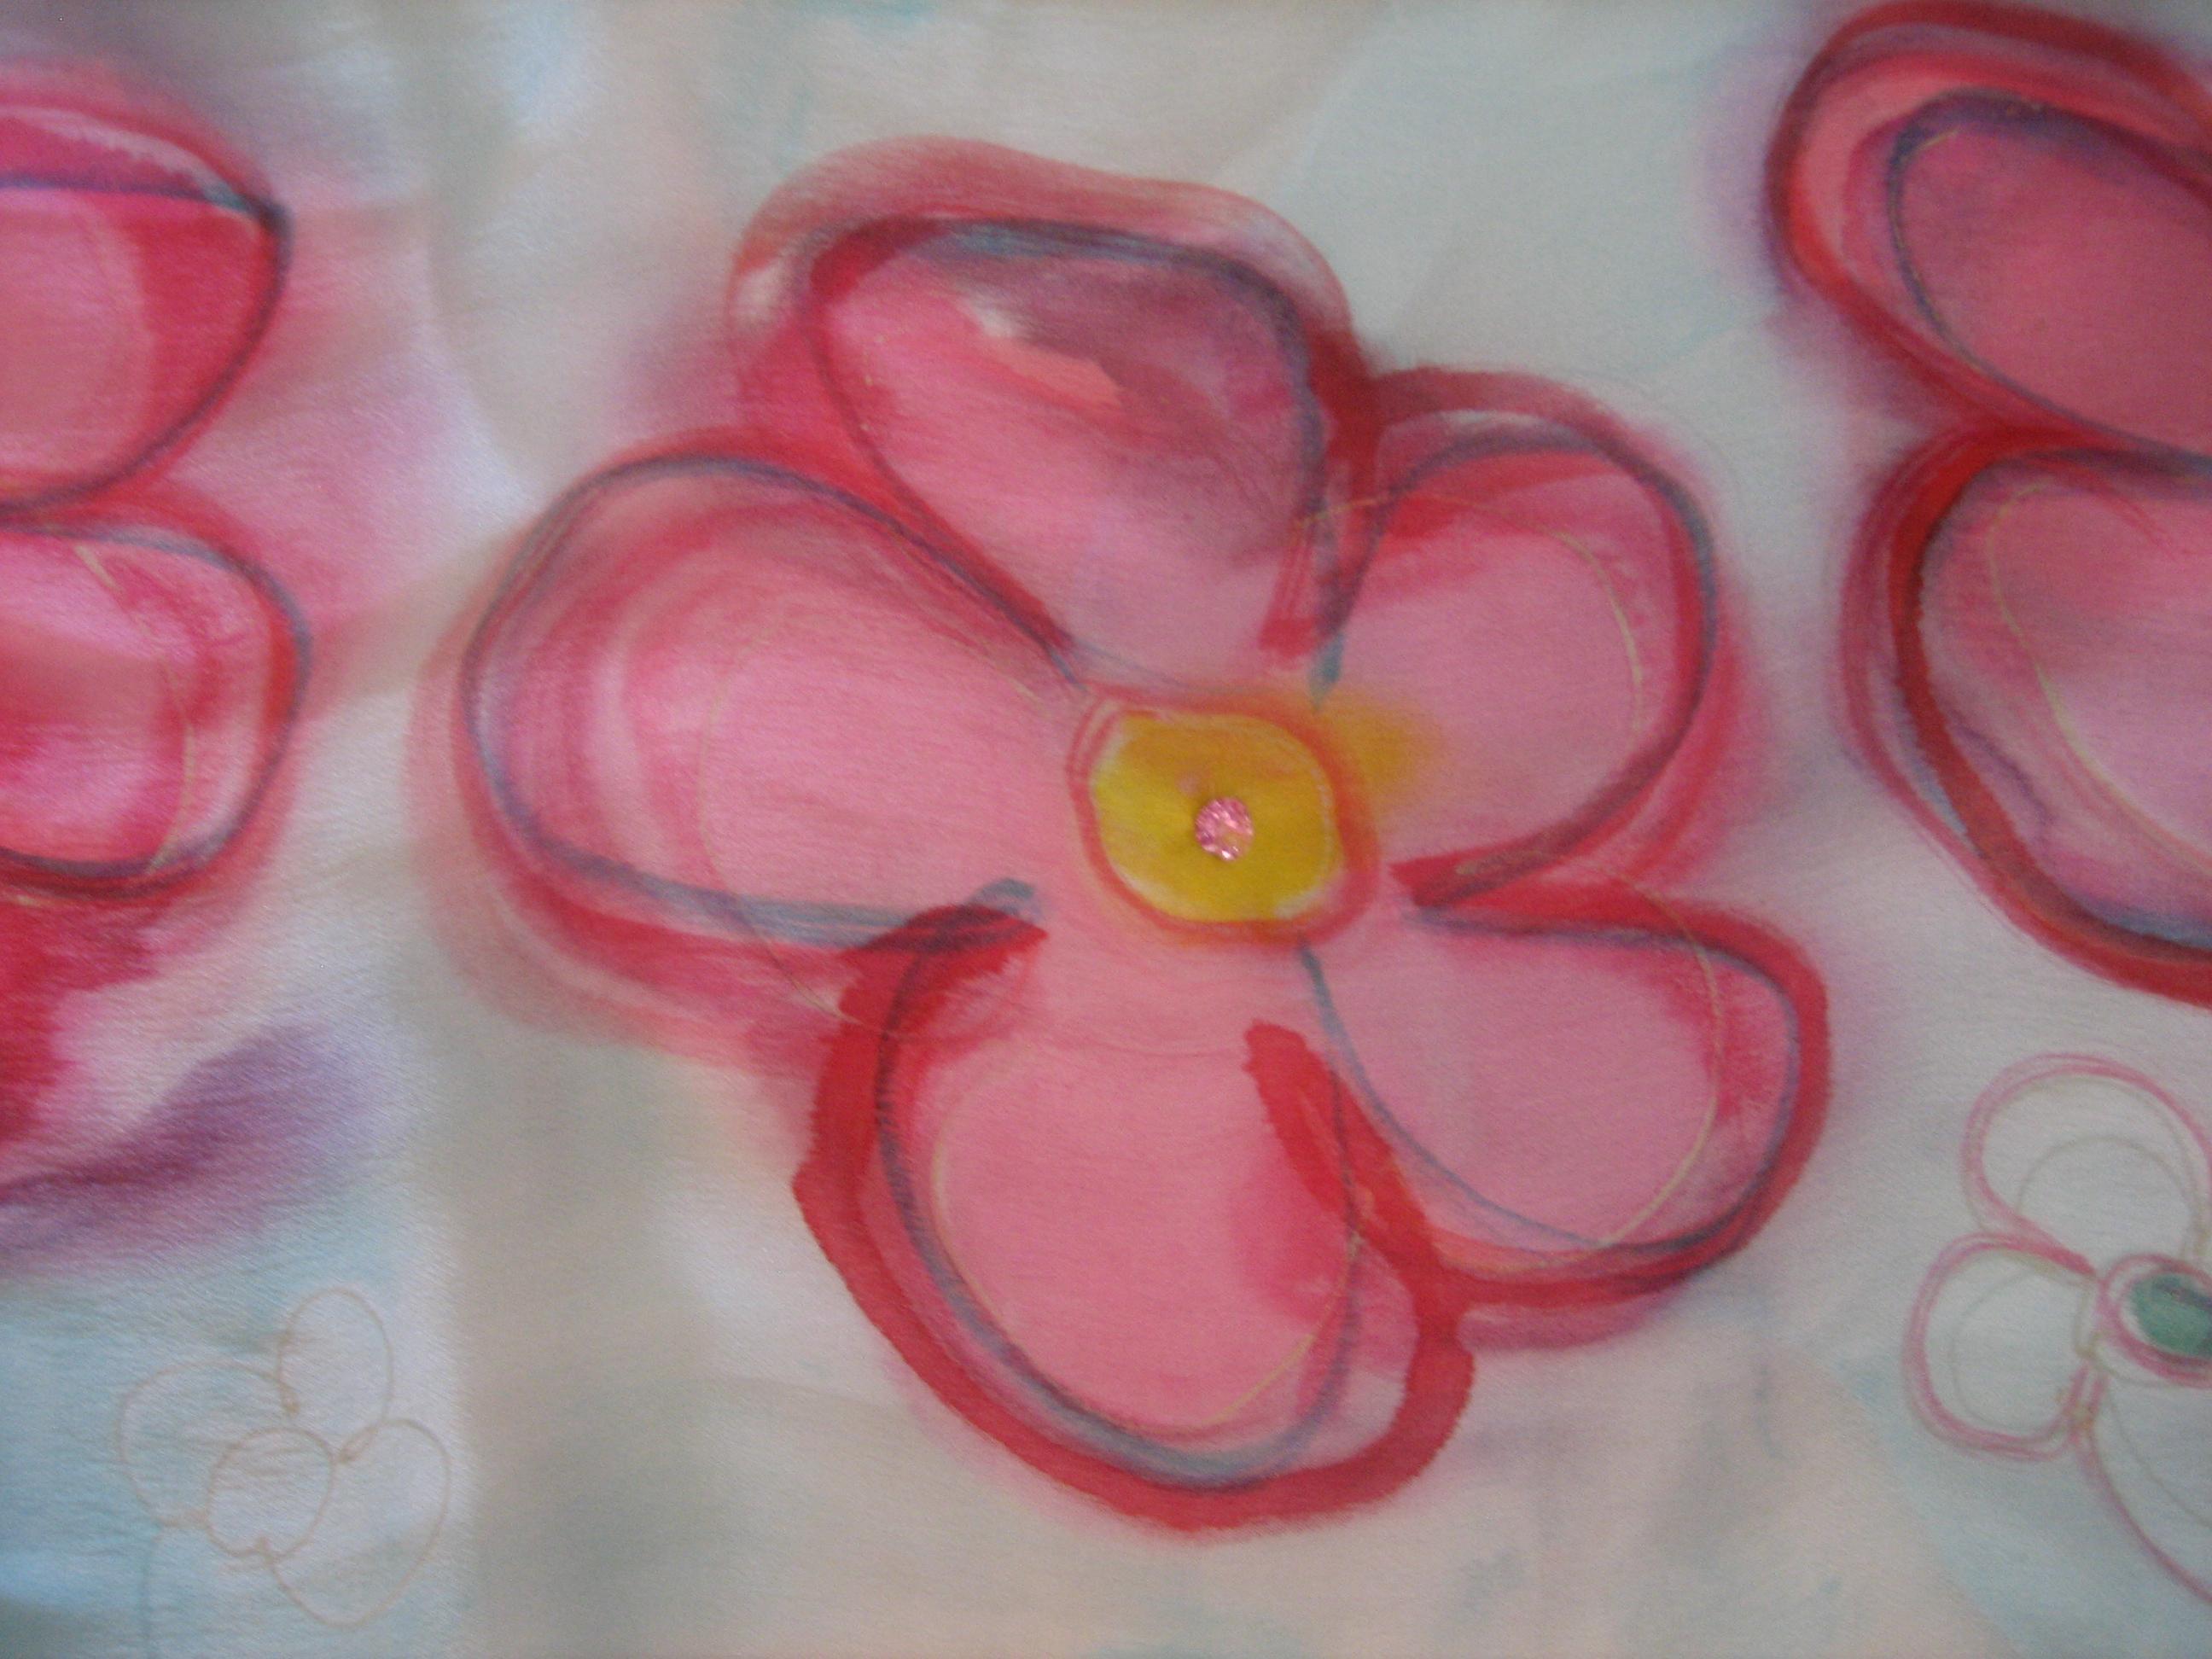 Detalle de flor bordada con svarosky  del pareo a flores crepe satén 2 m x 90 cm.